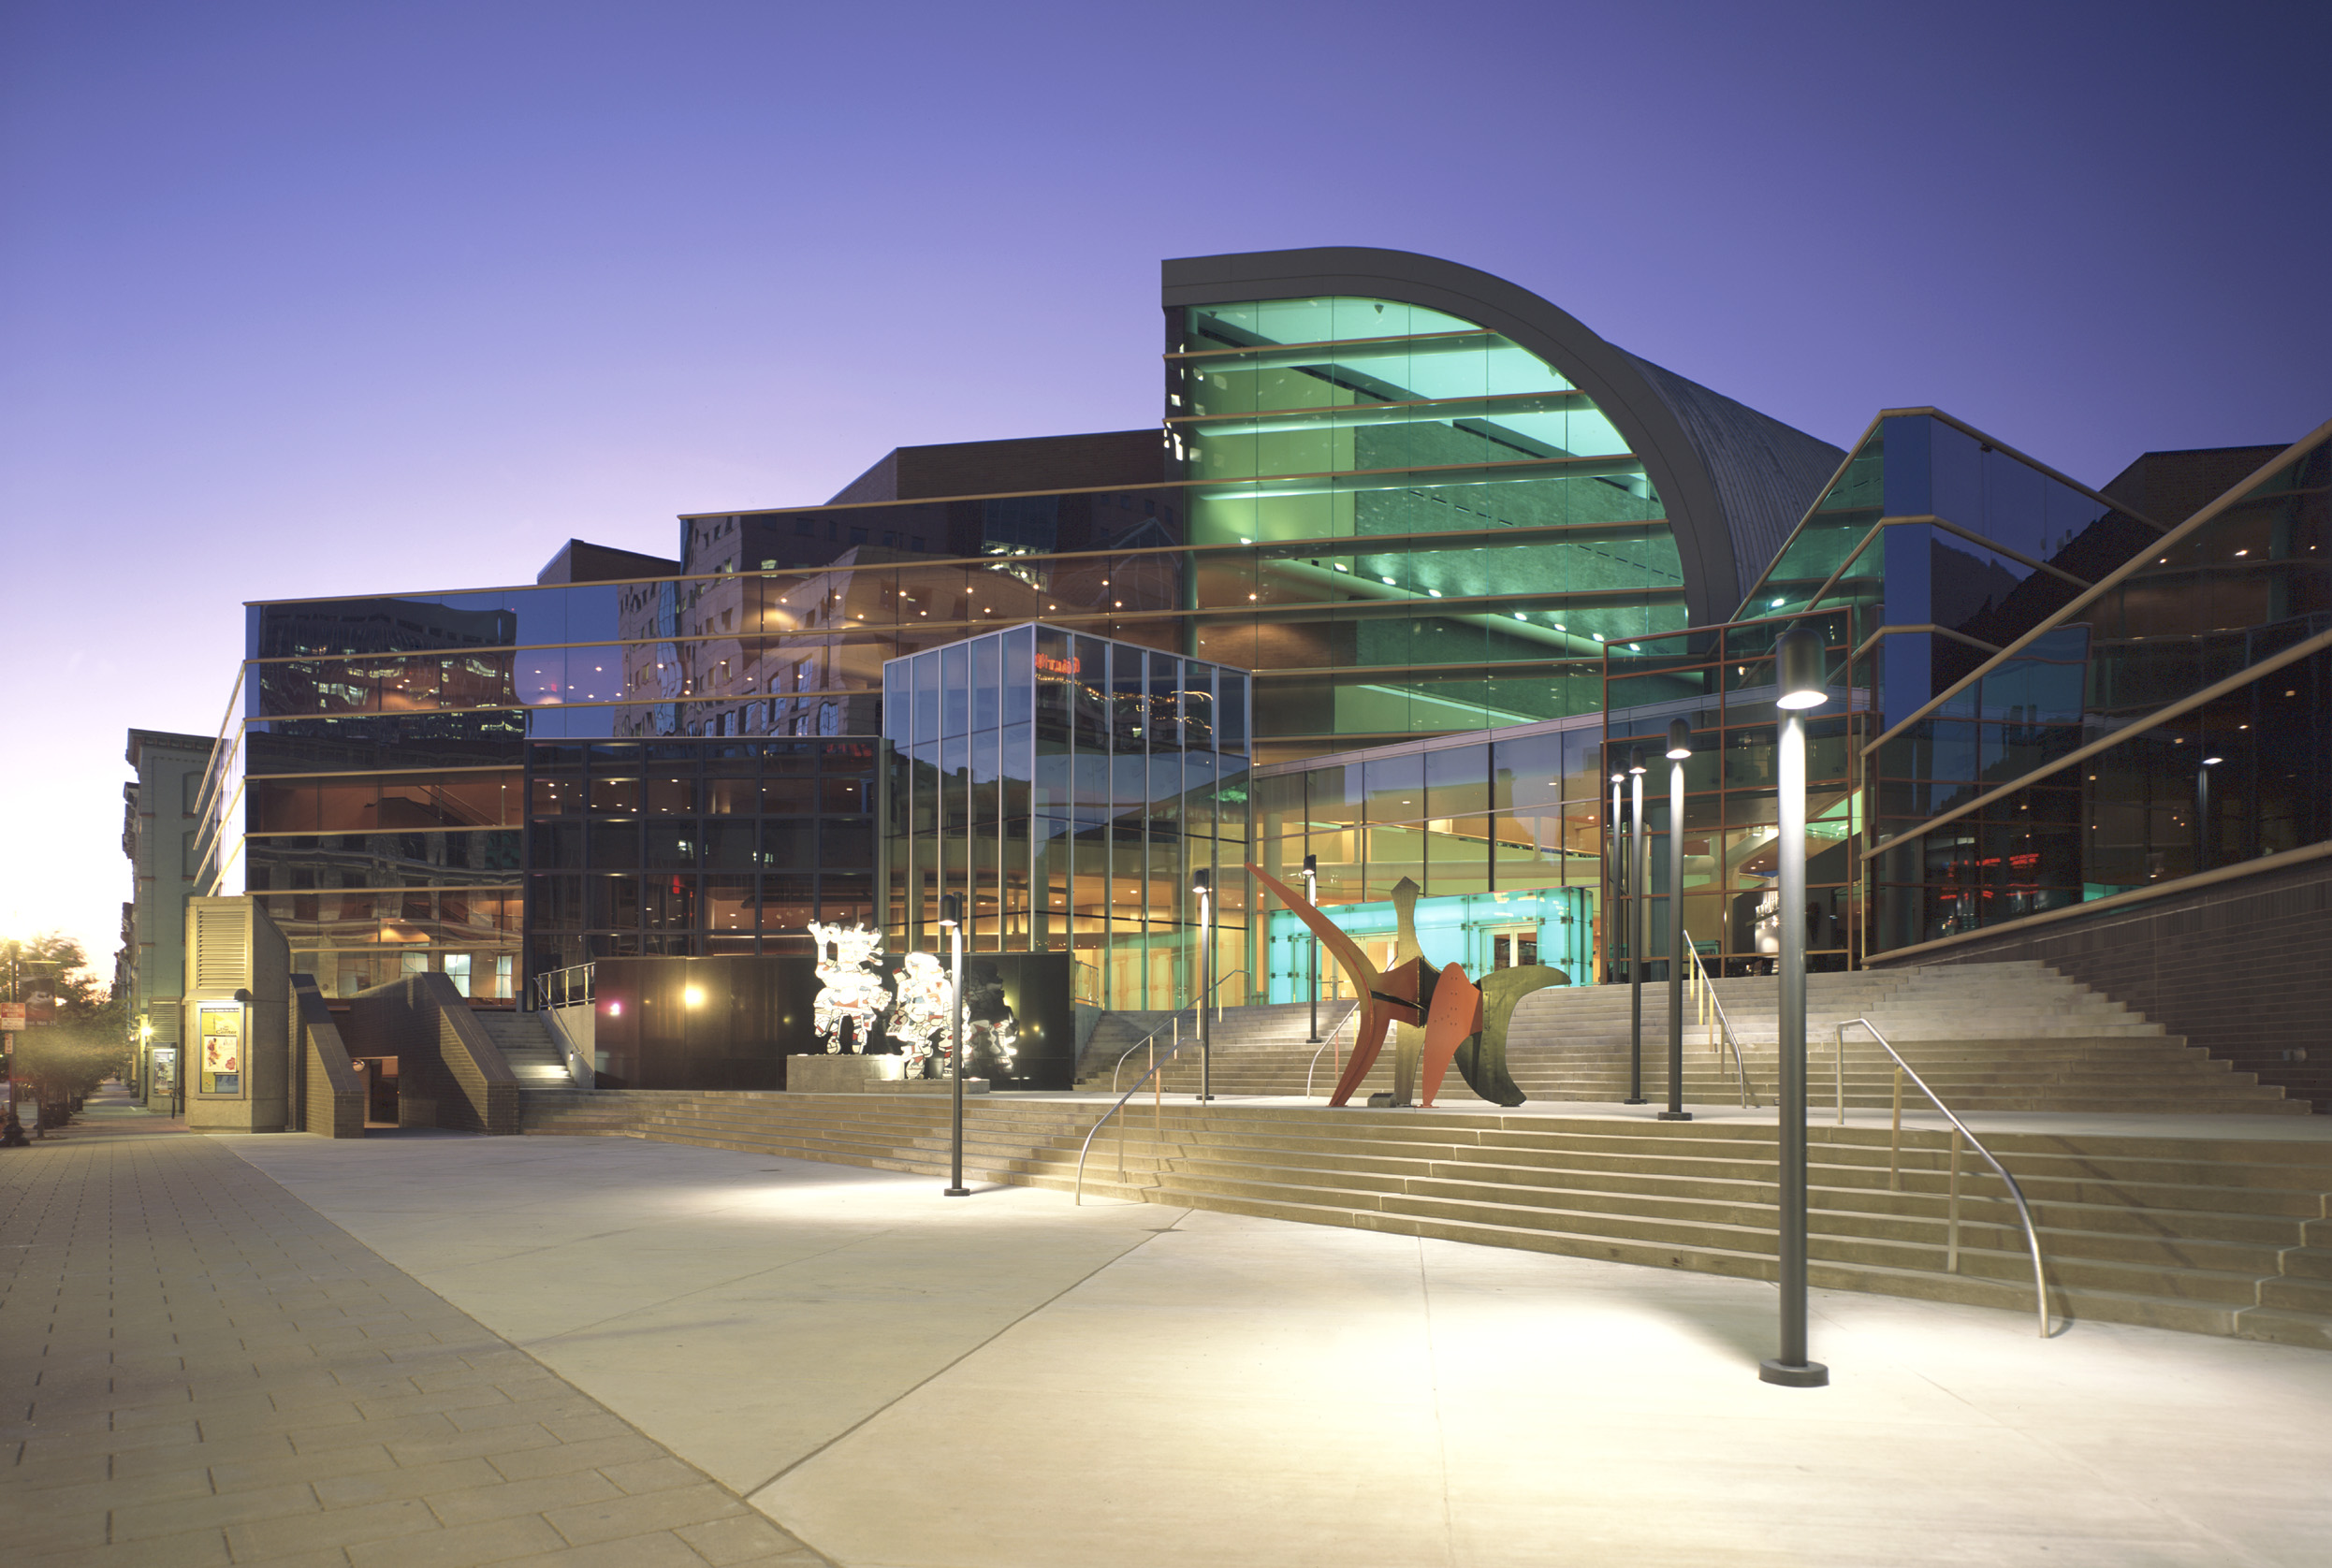 The Kentucky Center - Wikipedia